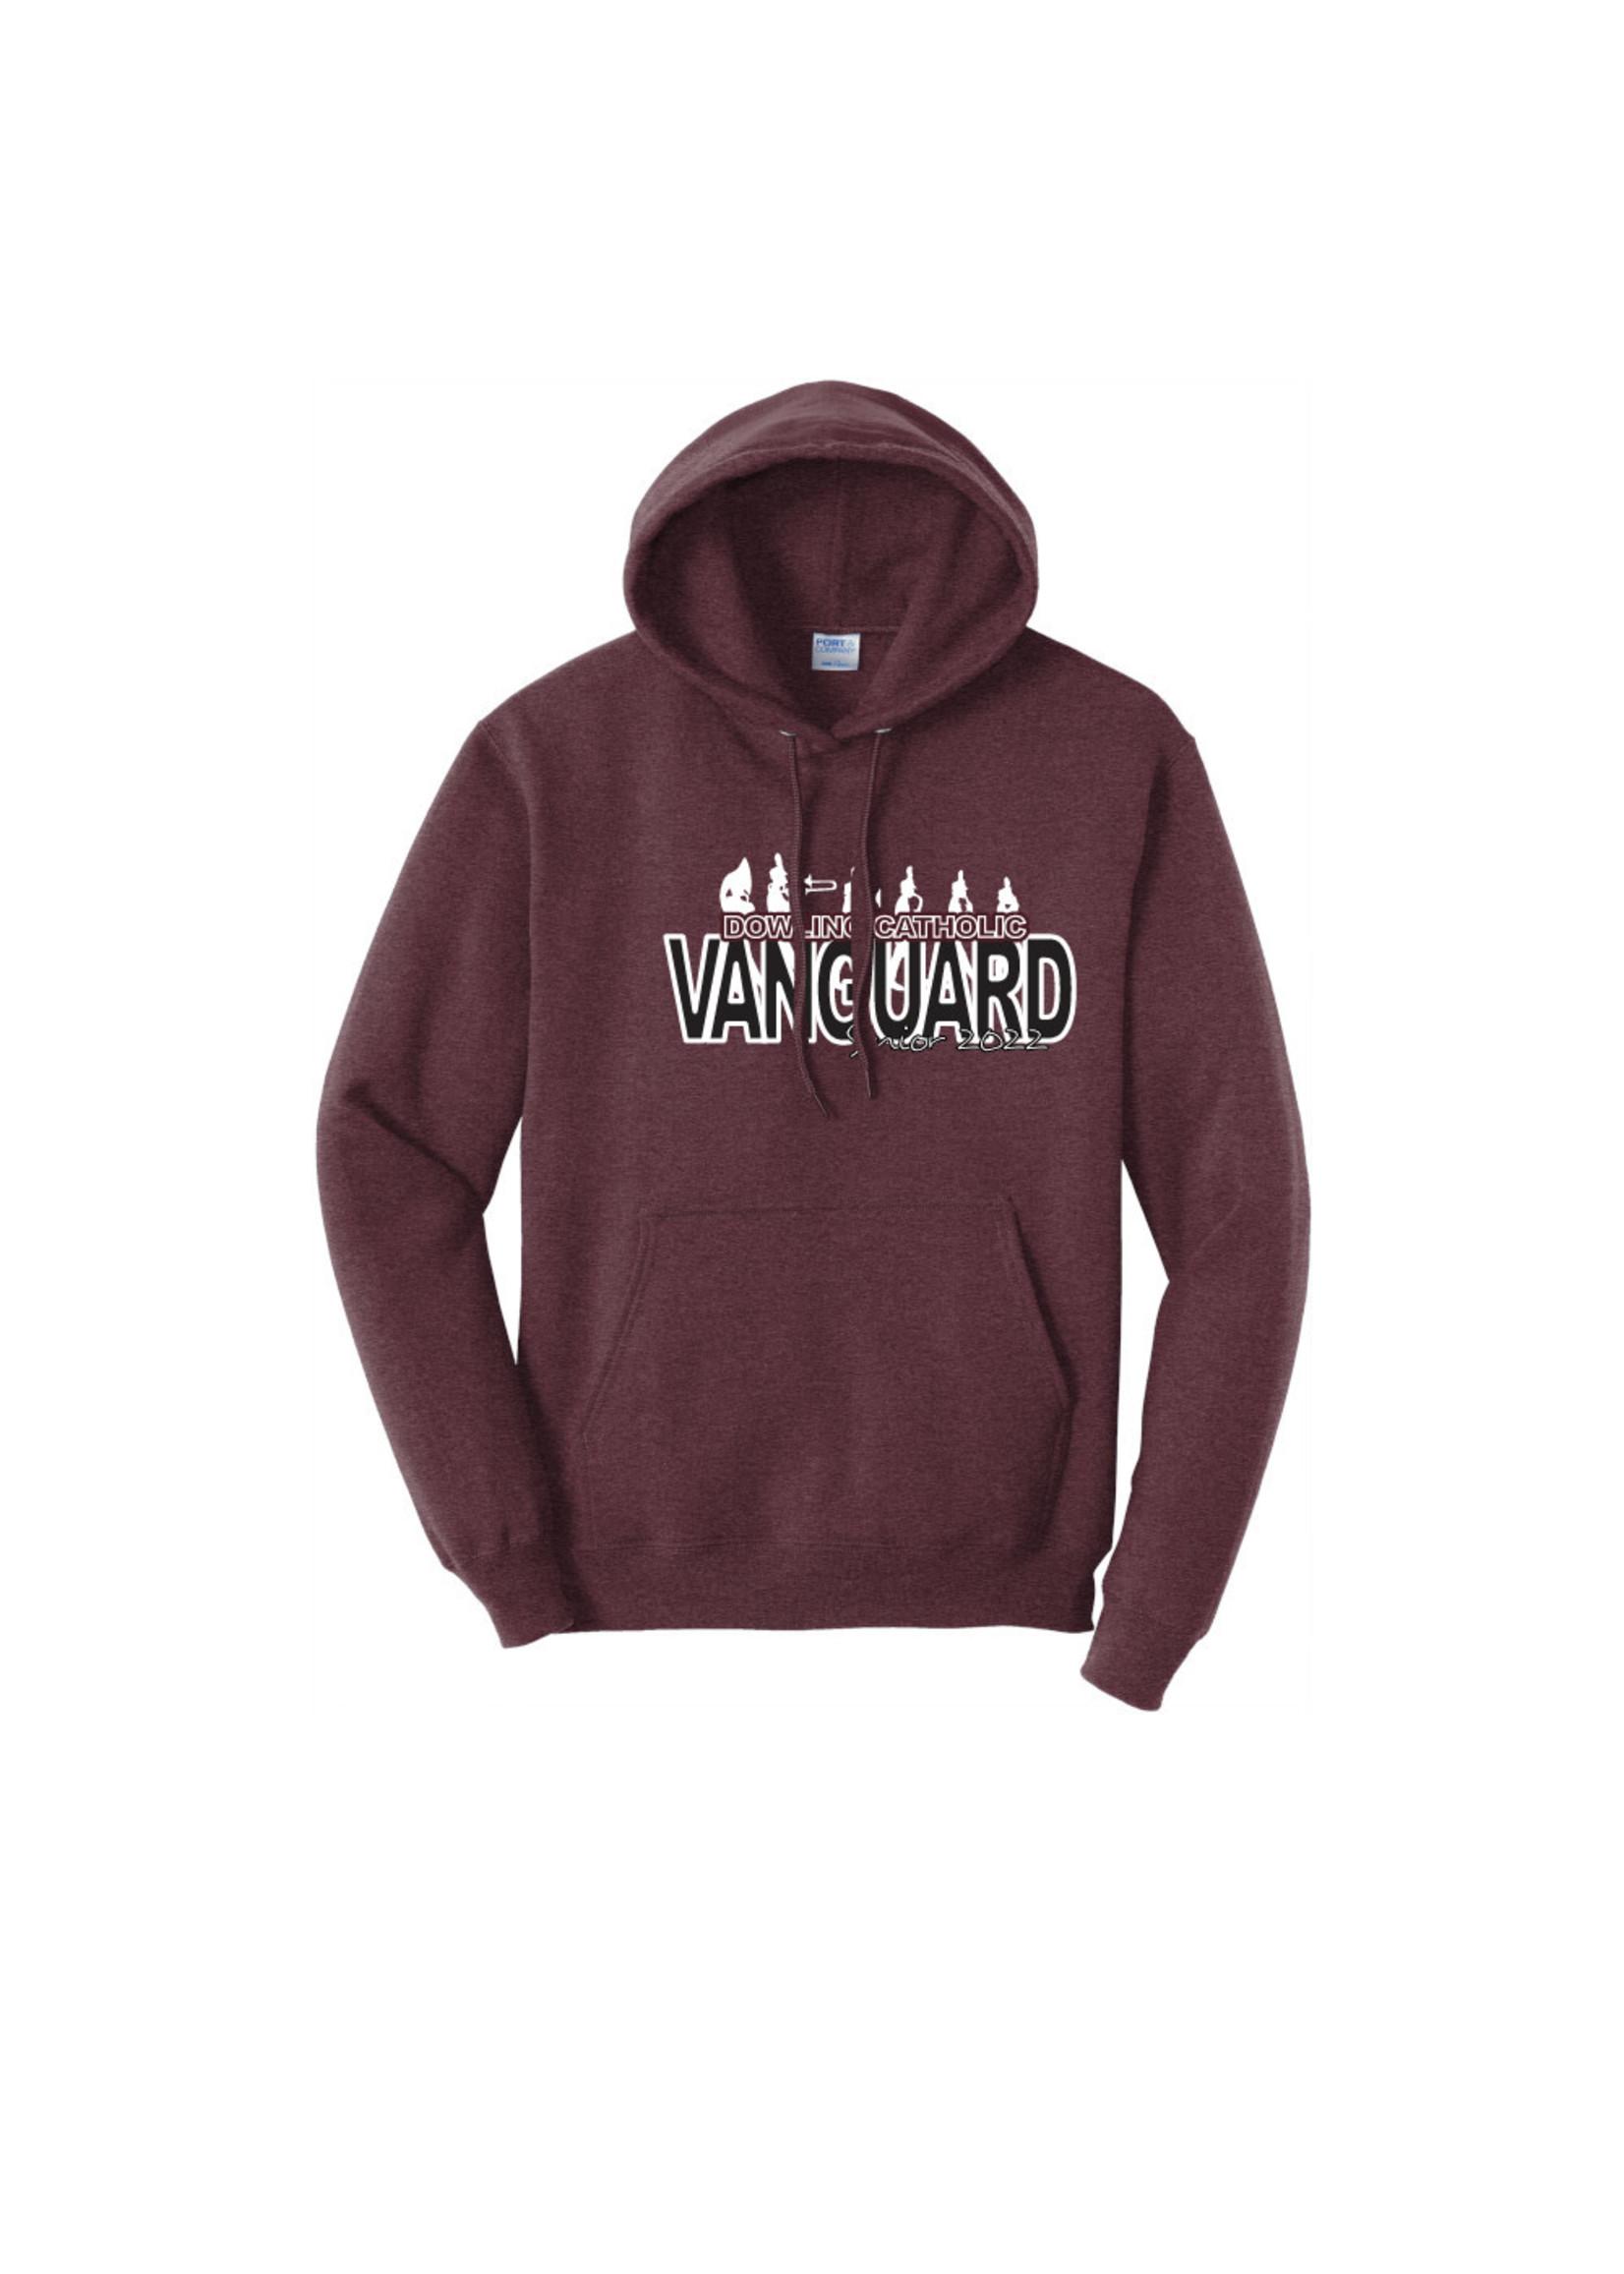 Port & Co. 2021 Vanguard  Hooded Sweatshirt